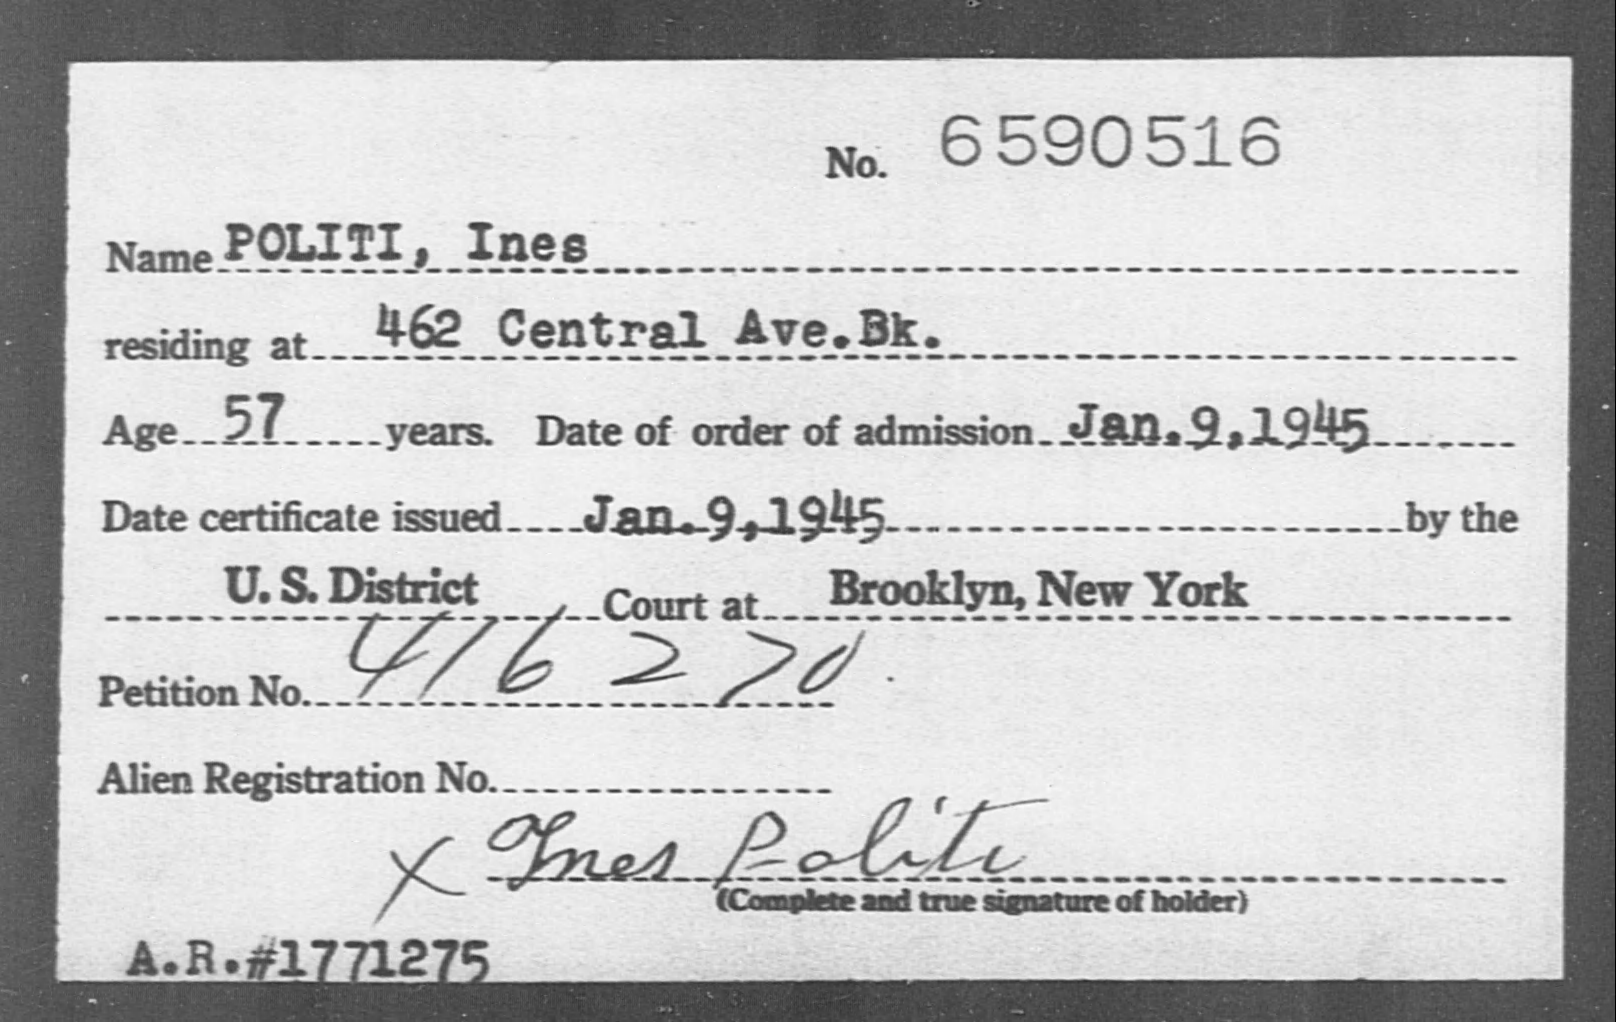 POLITI, Ines - Born: [BLANK], Naturalized: 1945